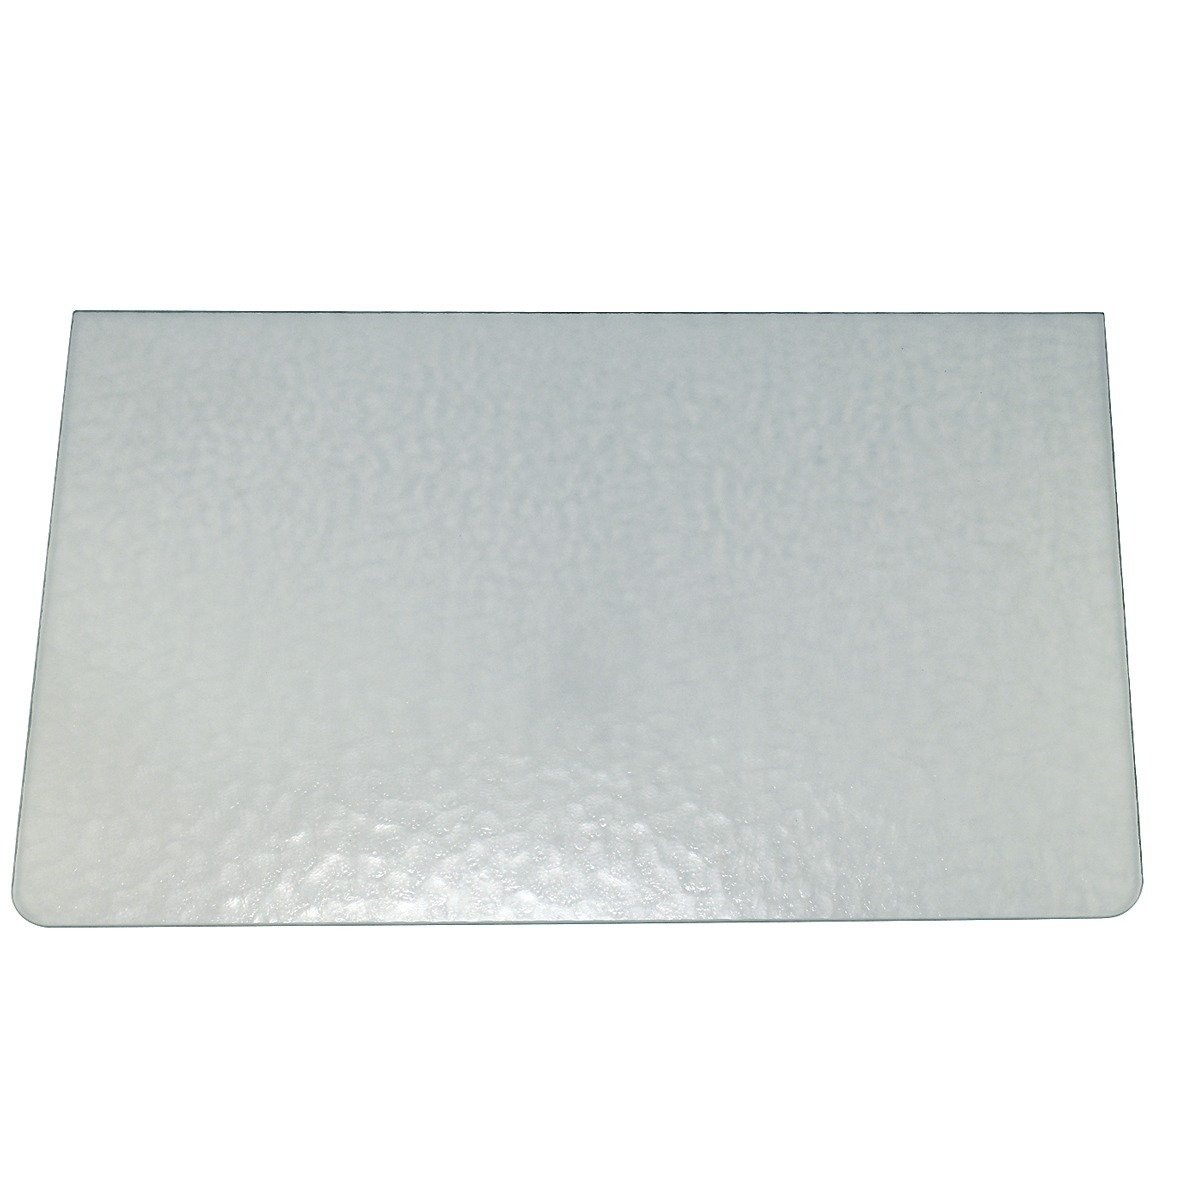 Original Liebherr tablero de cristal cubierta 533 X 334 ...